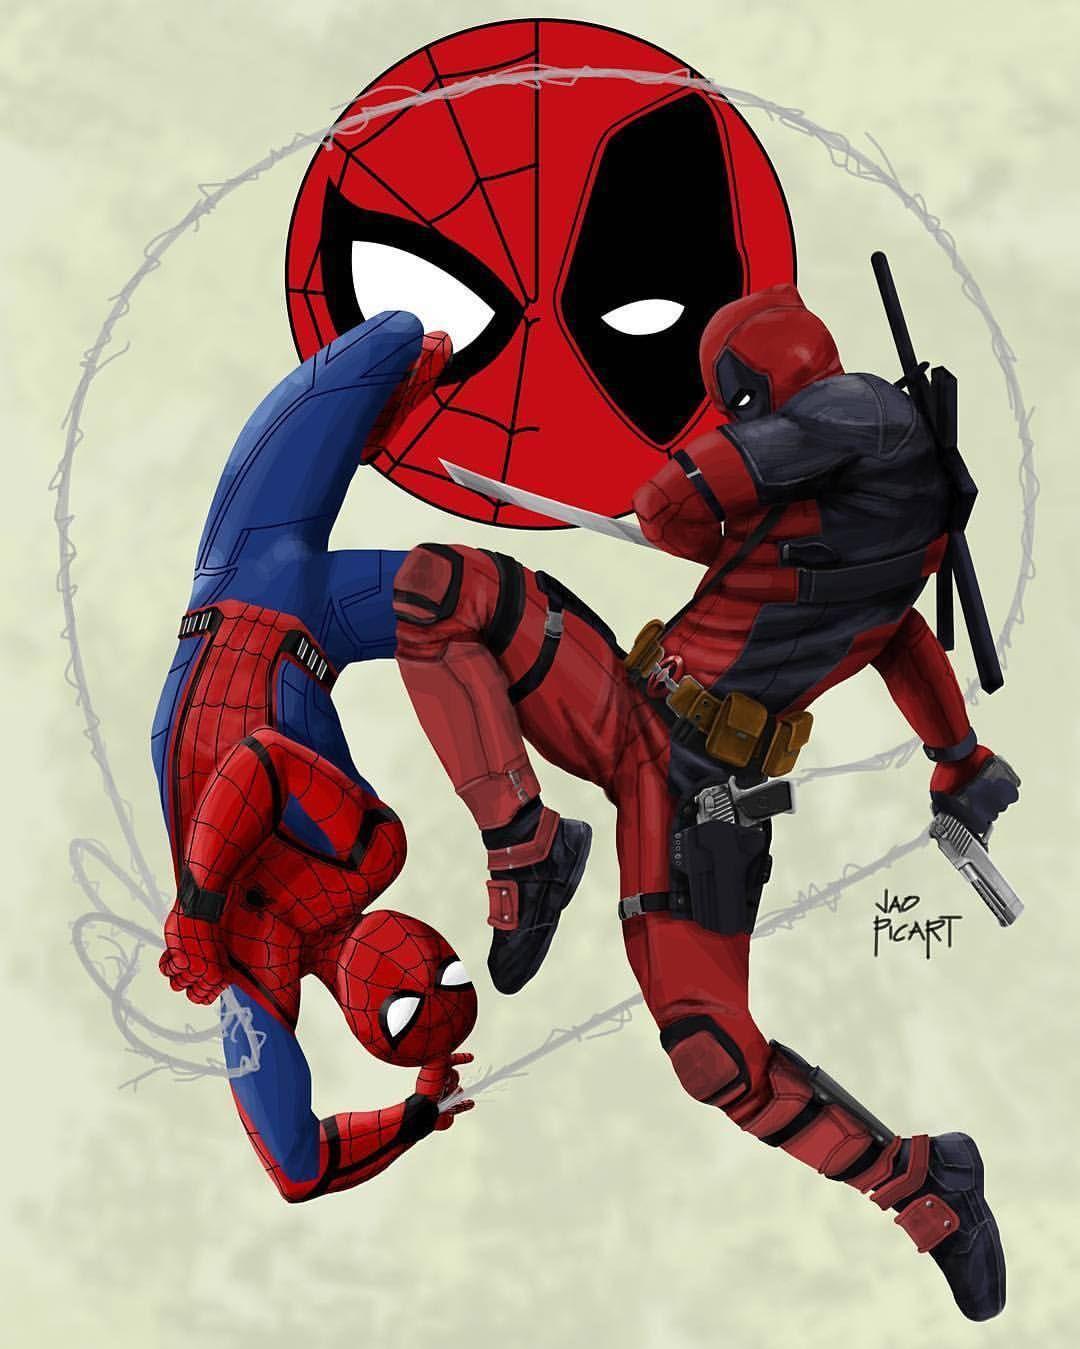 Deadpool And Spider Man 1: By Jaopicksart Spider-Man: Homecoming & Deadpool Crossover